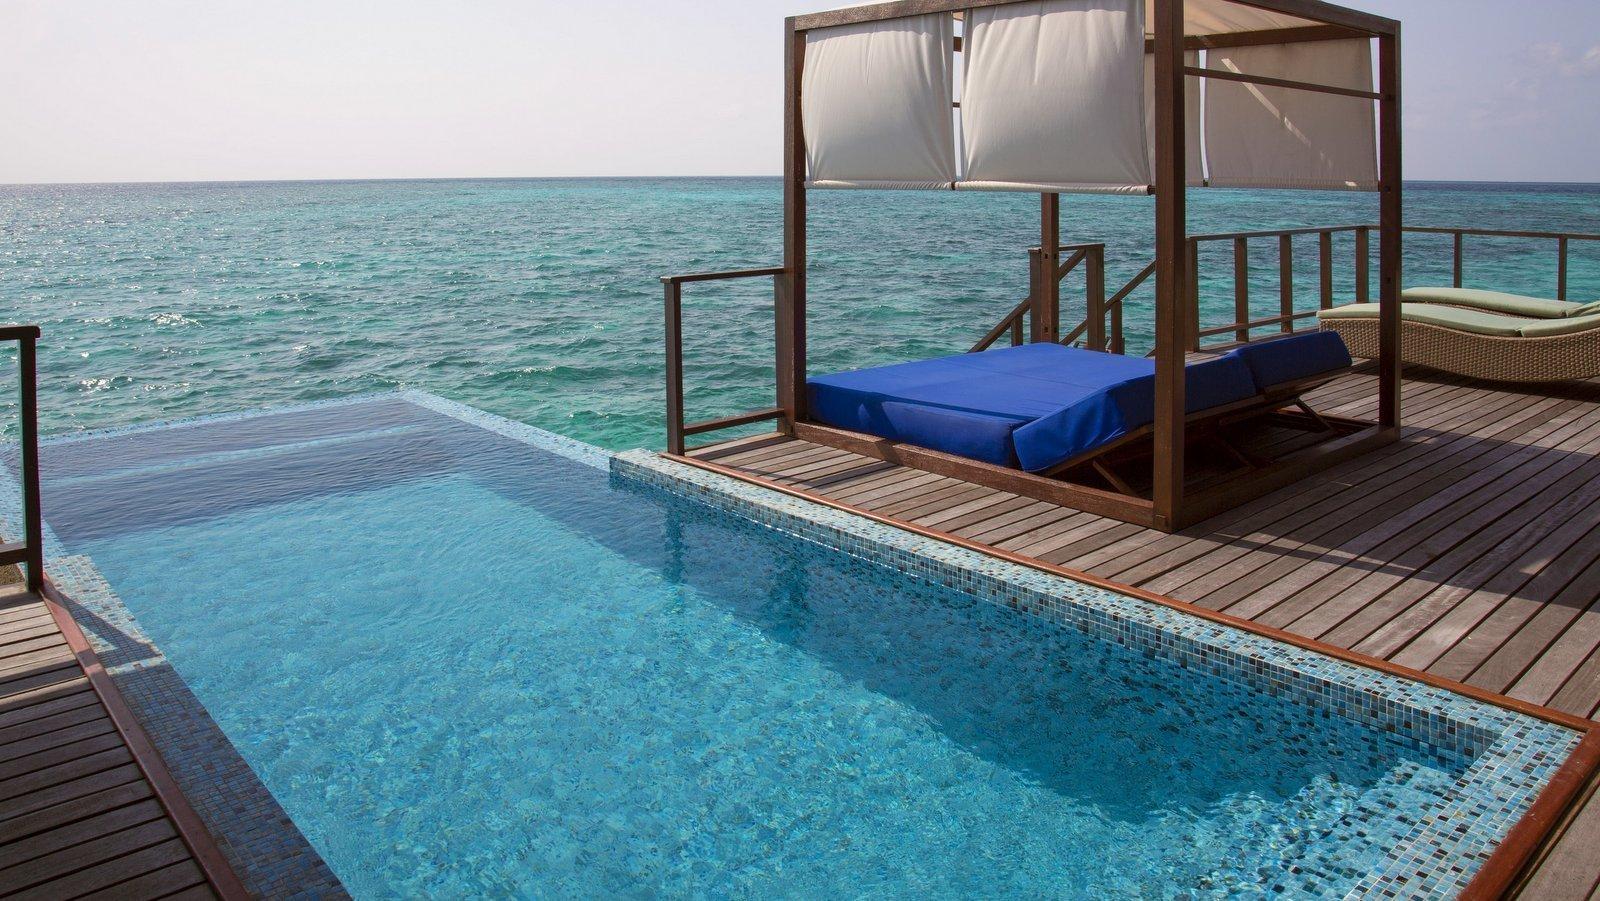 Мальдивы, отель Coco Palm Bodu Hithi, номер Coco Residence